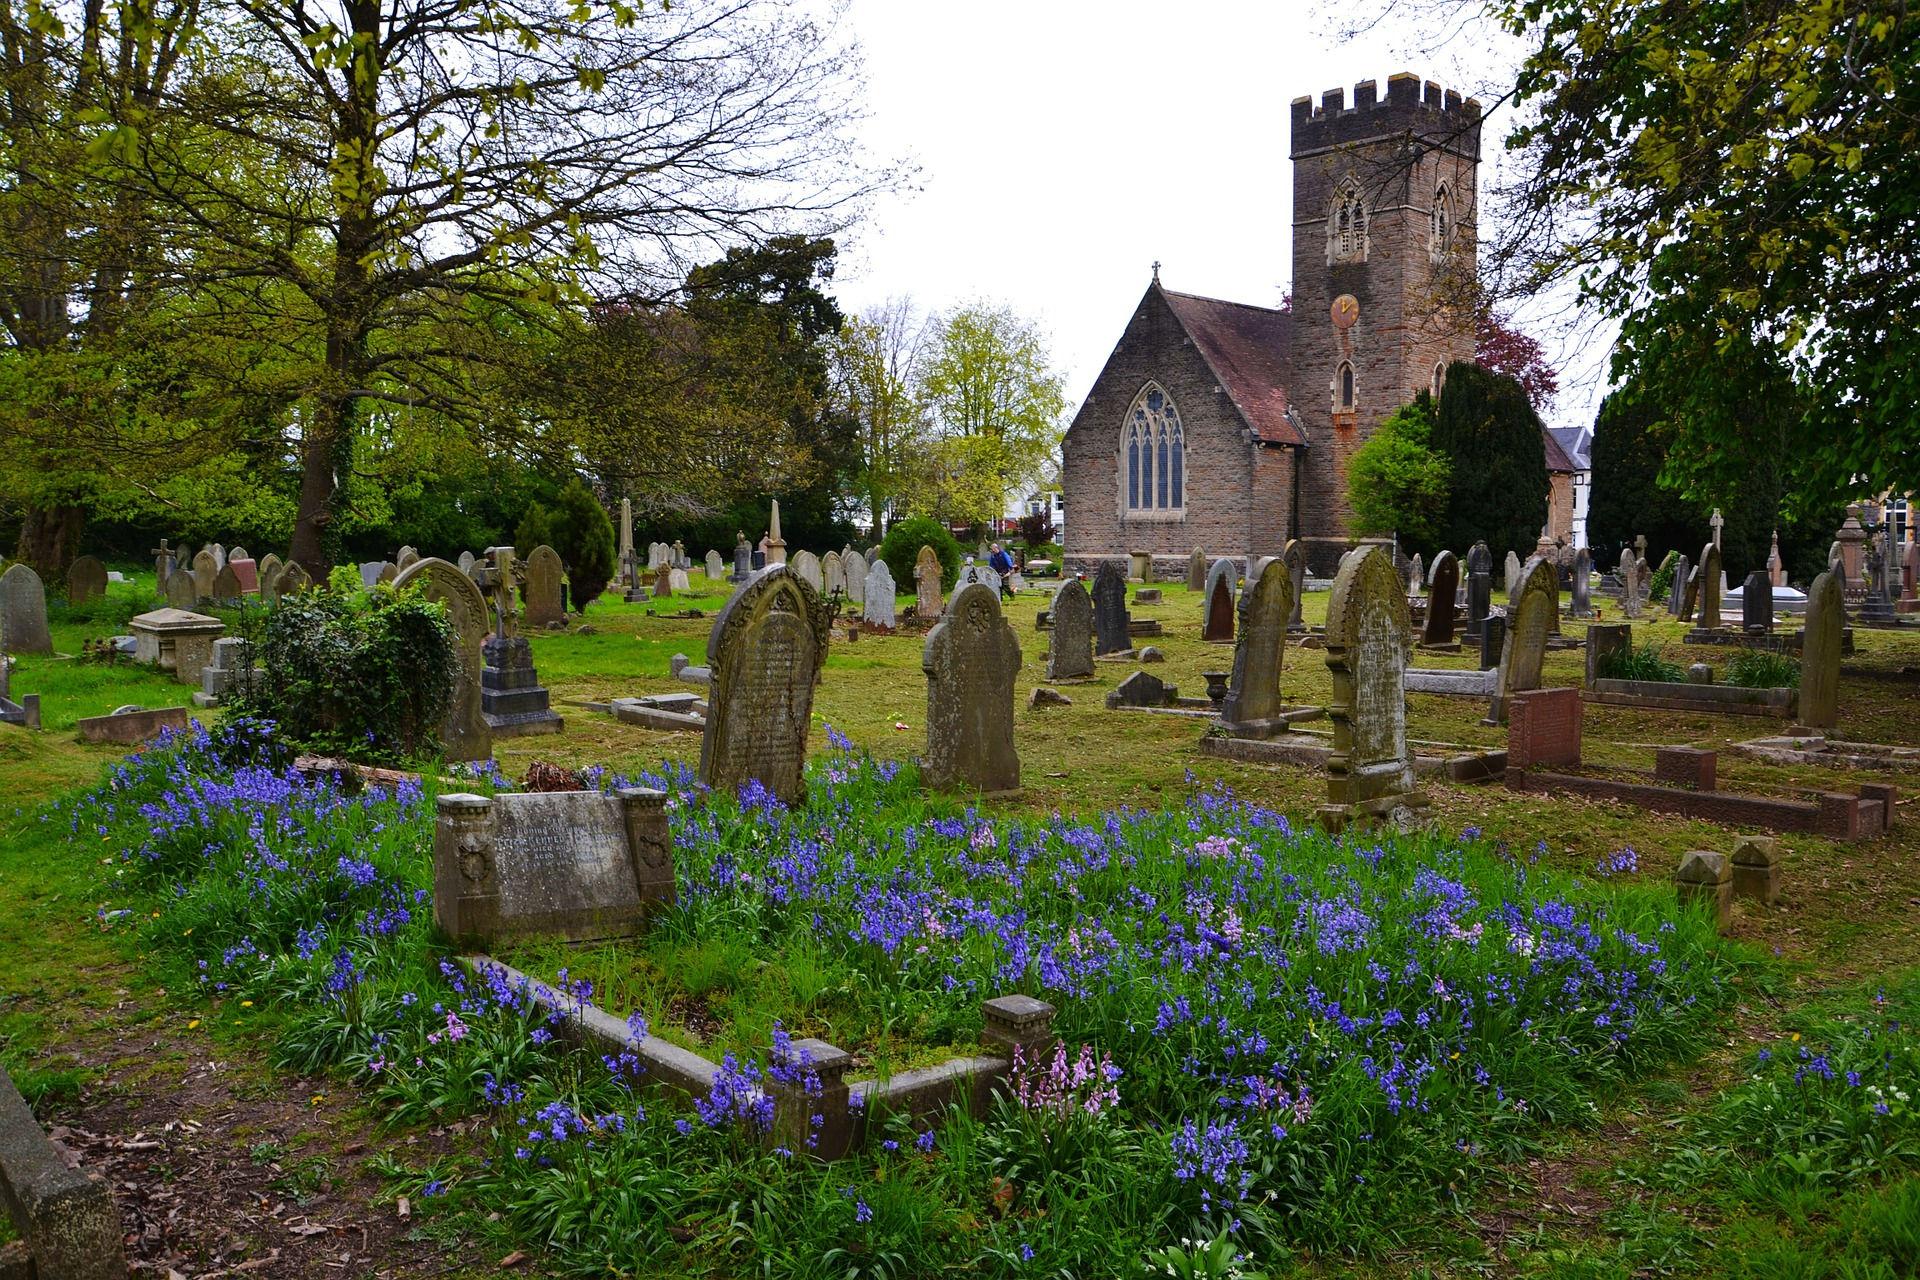 Churchyard biodiversity. Photo credit: terimakasih0 on Pixabay.